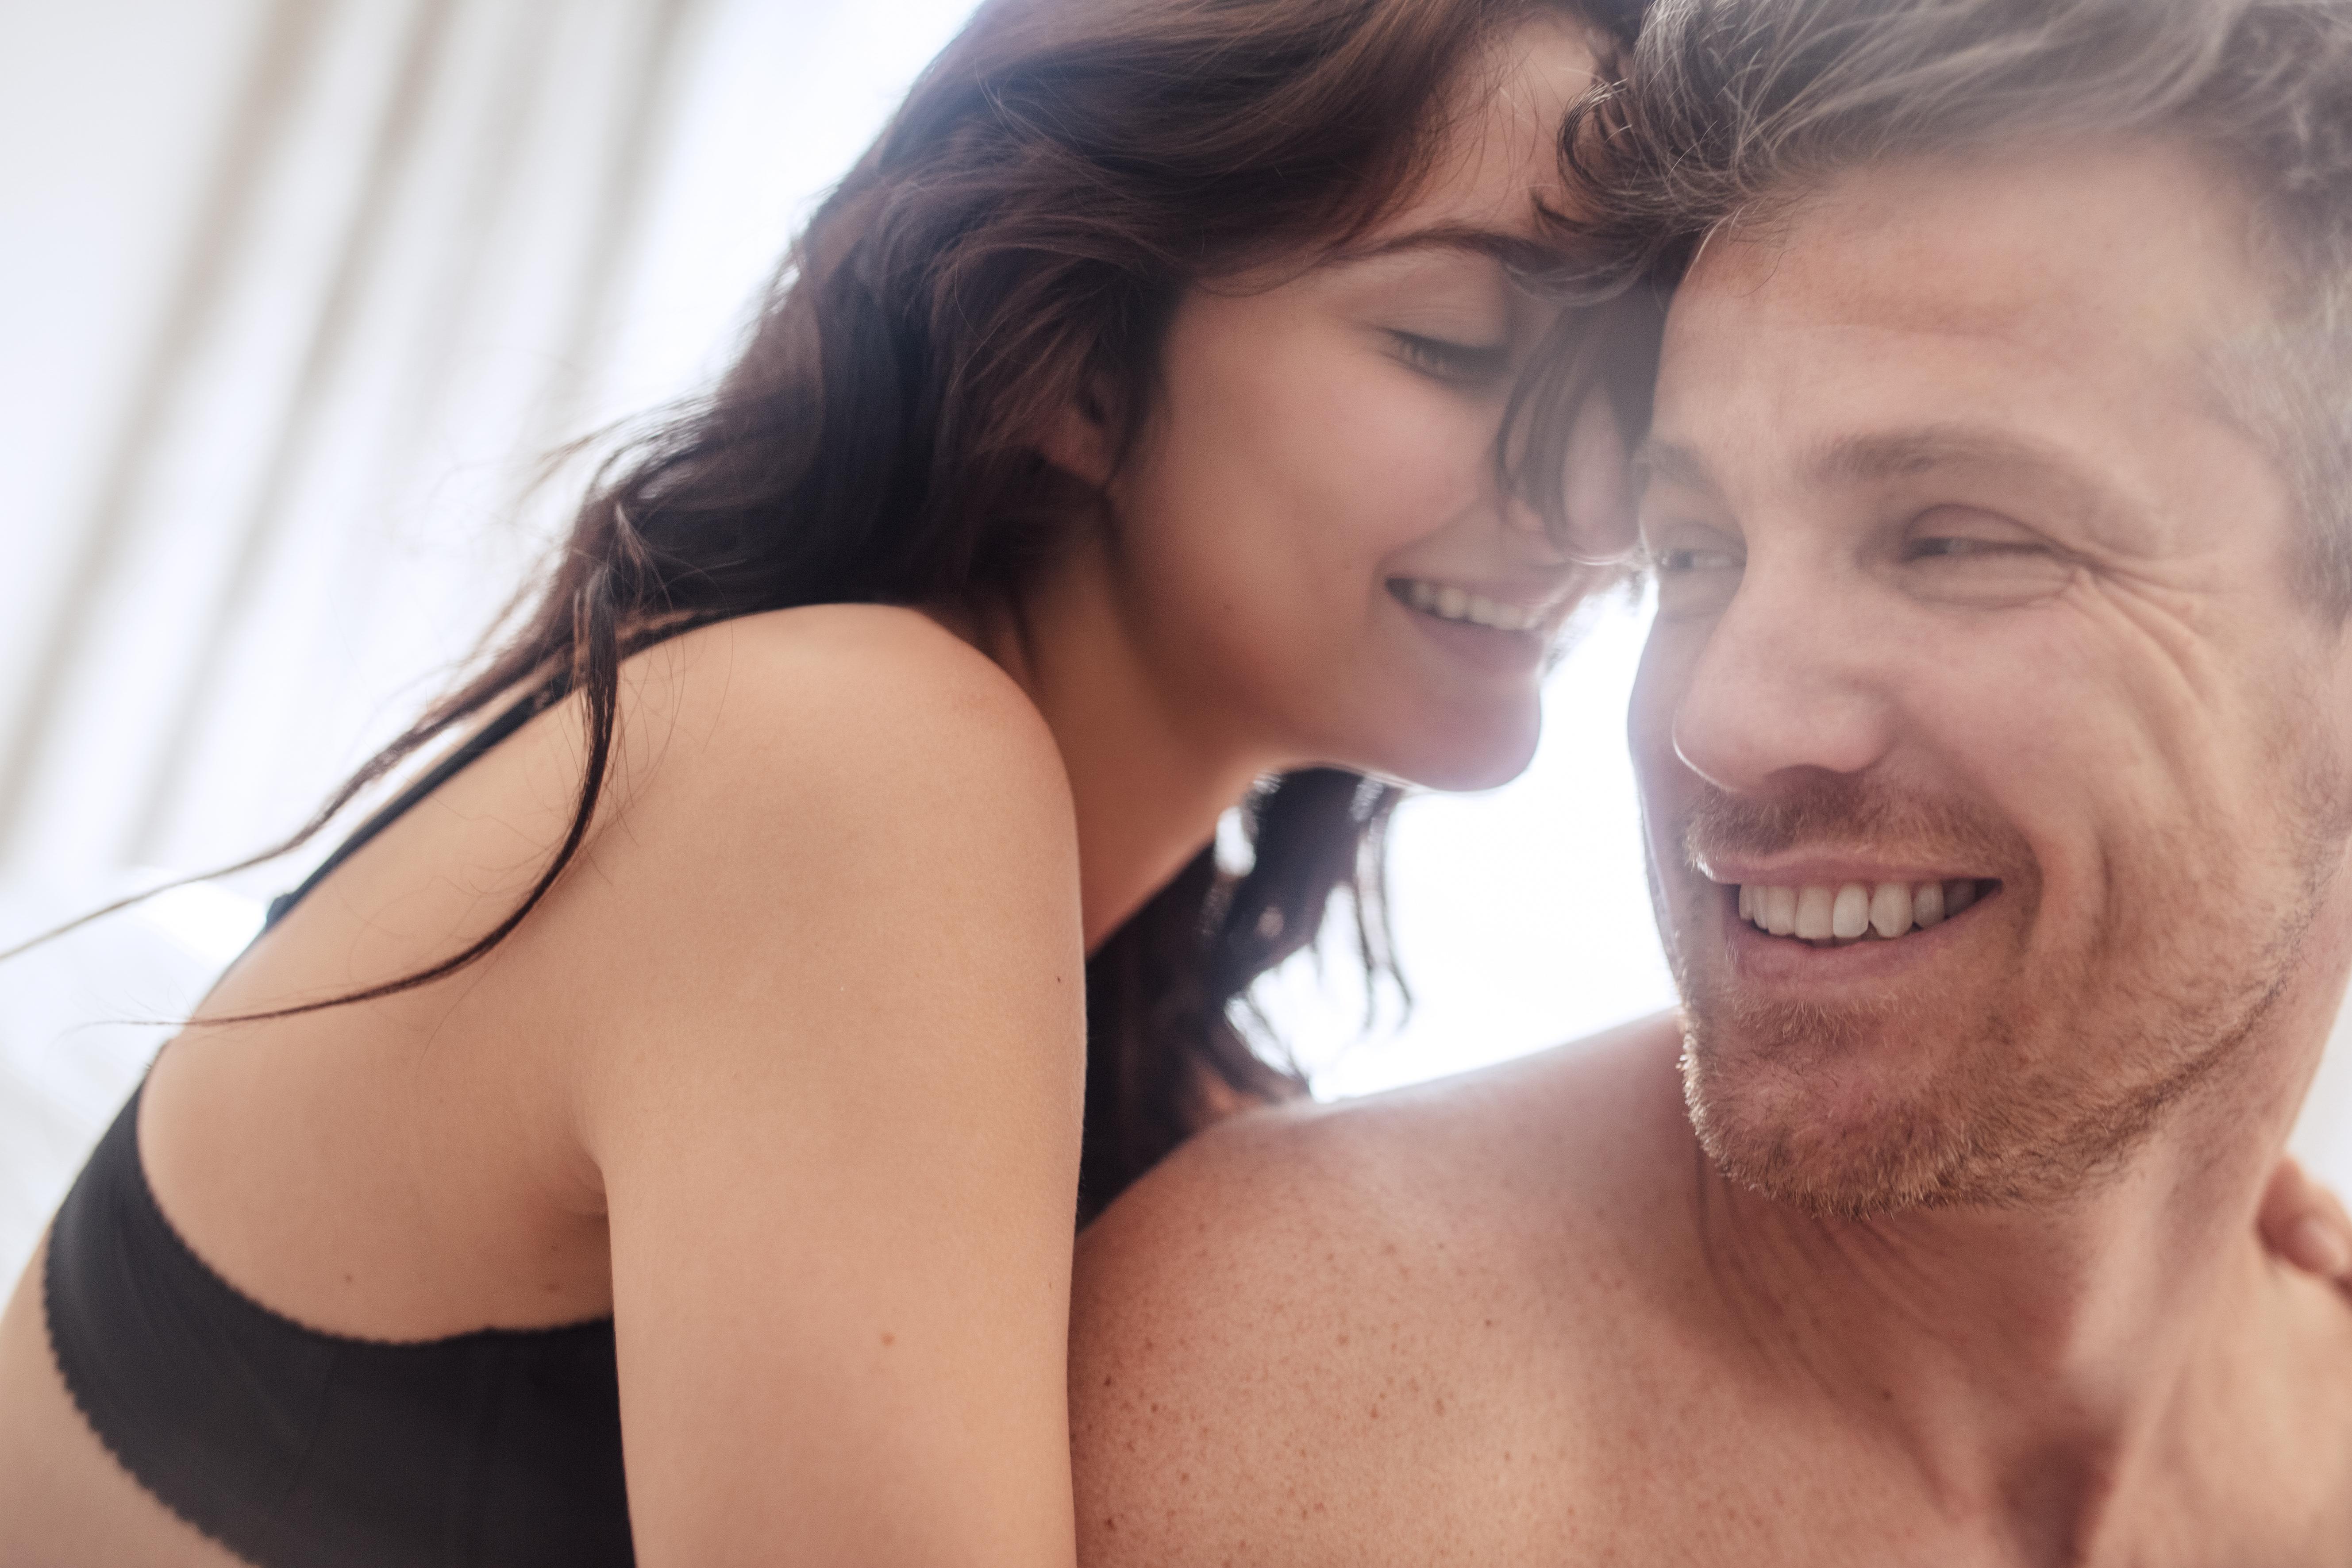 labiaplasty-vaginal-rejuvenation